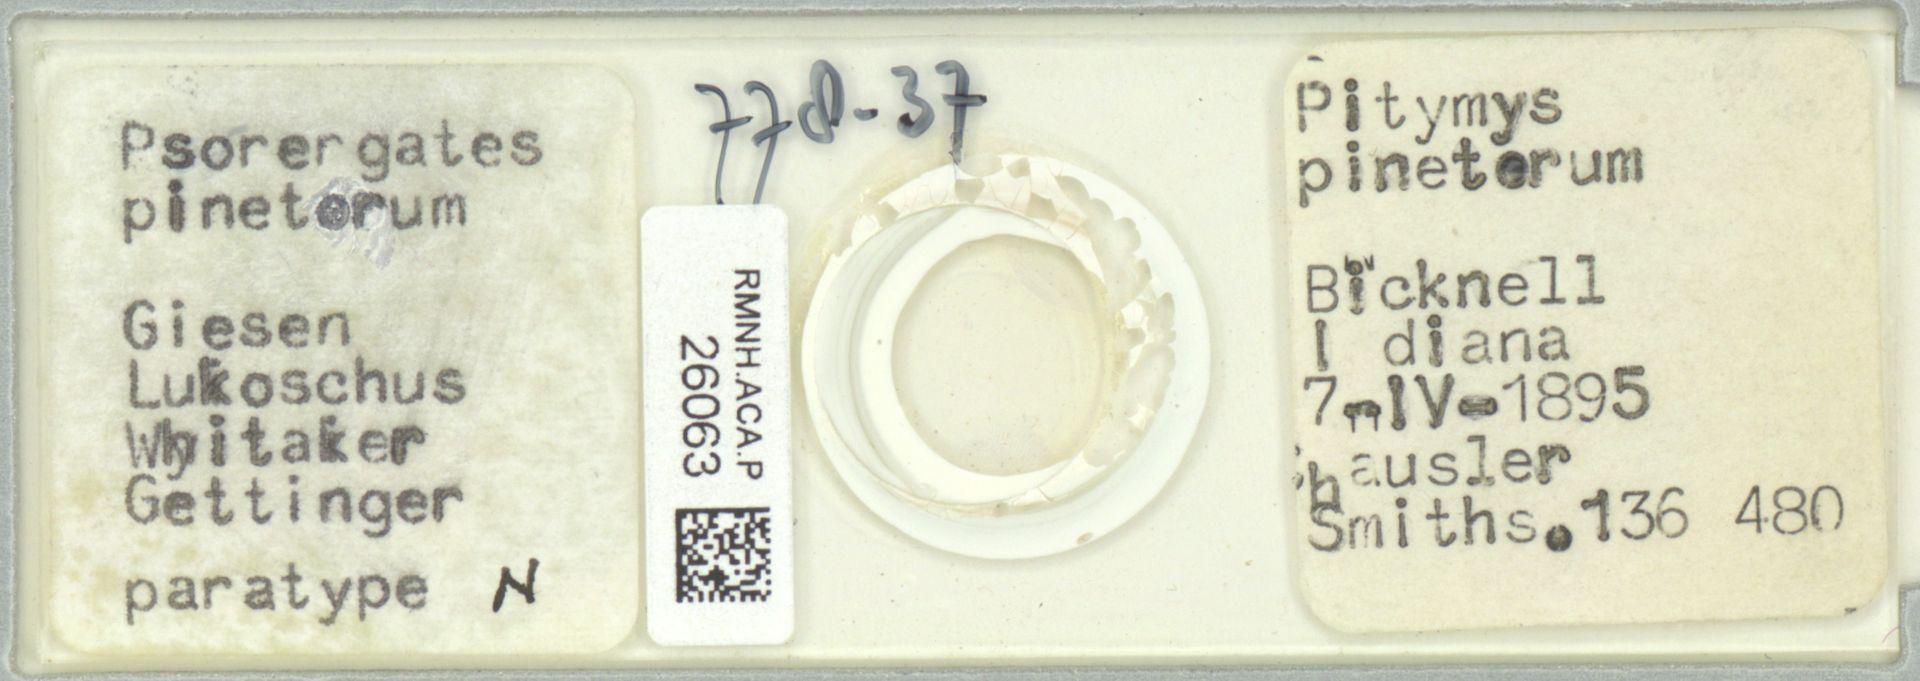 RMNH.ACA.P.26063 | Psorergates pinetorum Giesen Lukoschus Whitaker Gettinger